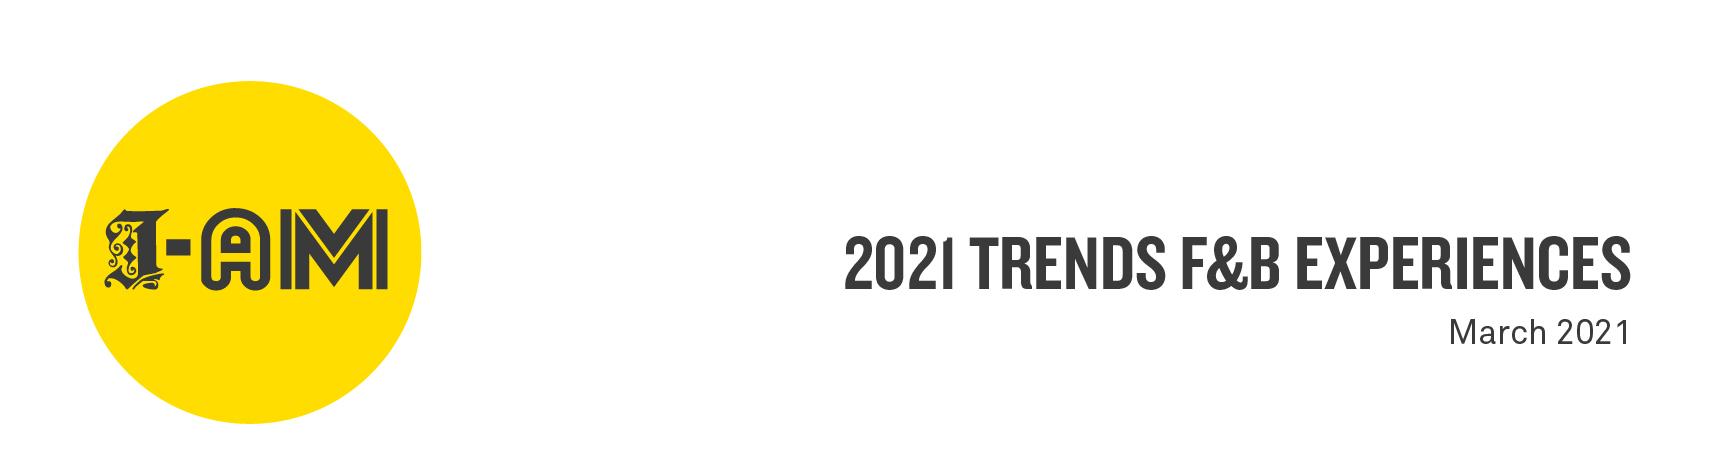 F&B 2021 trends blog banner-09